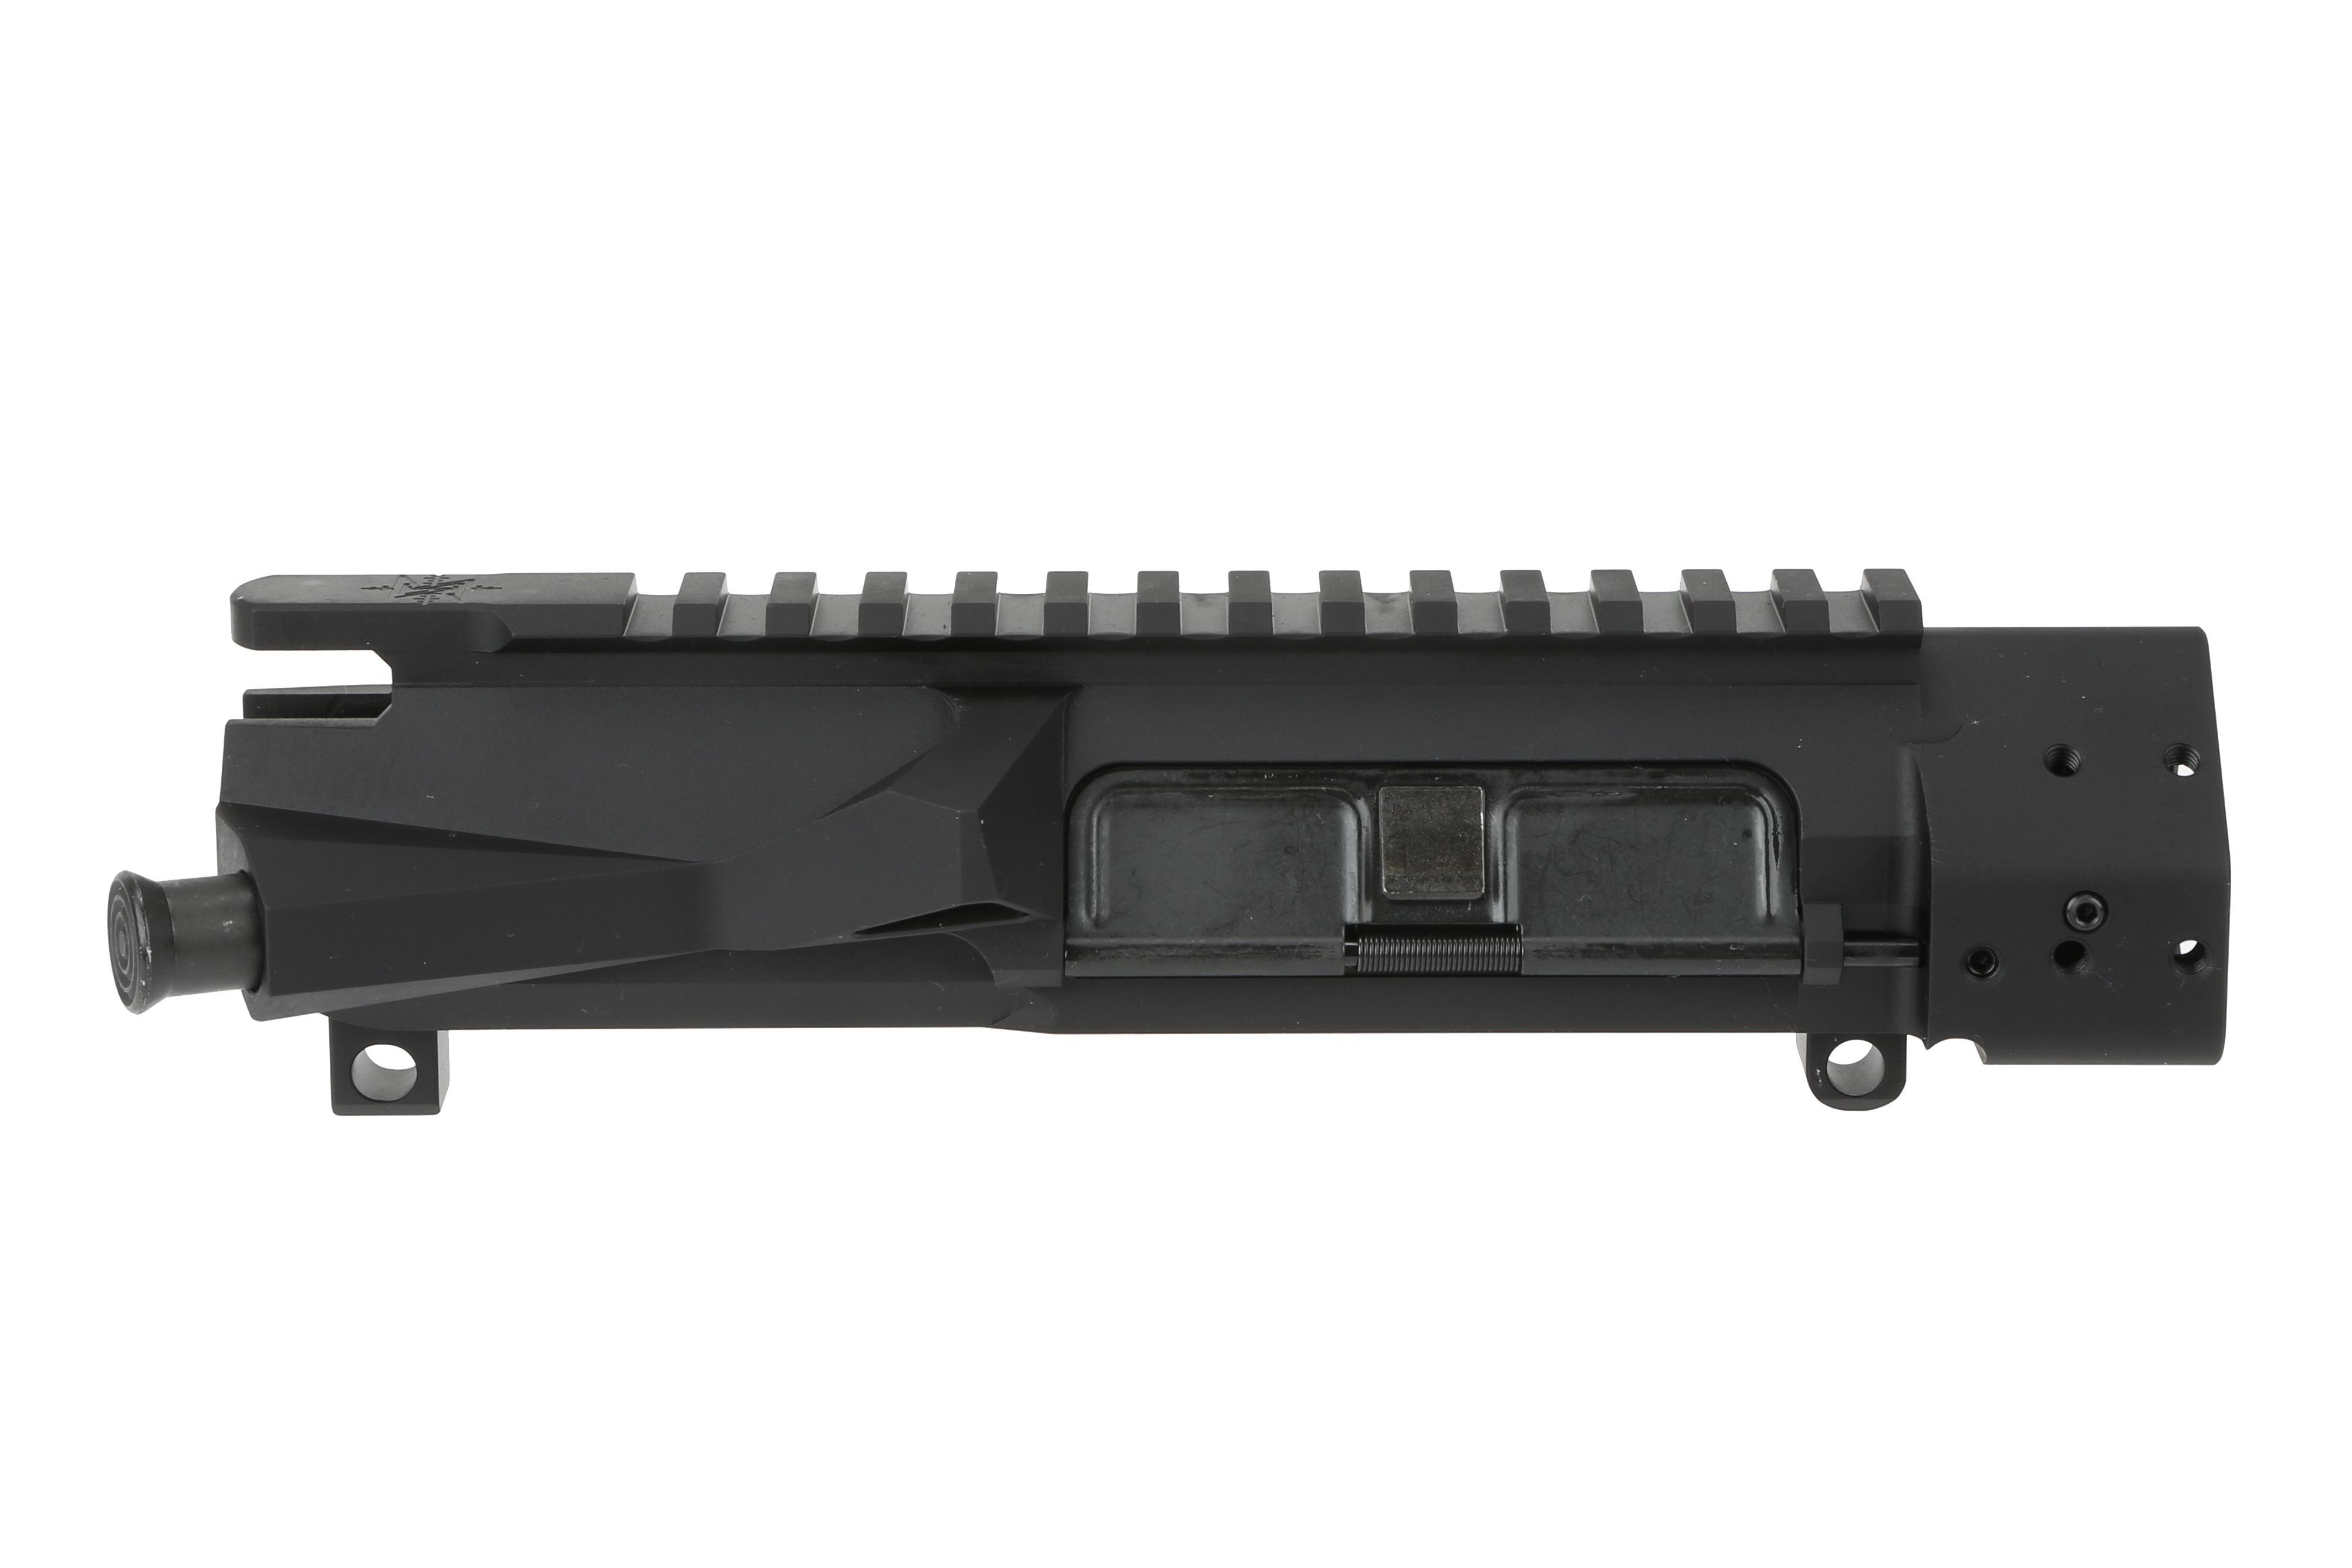 Seekins Precision Irmt 3 V3 Billet Upper Receiver Sp0010900011